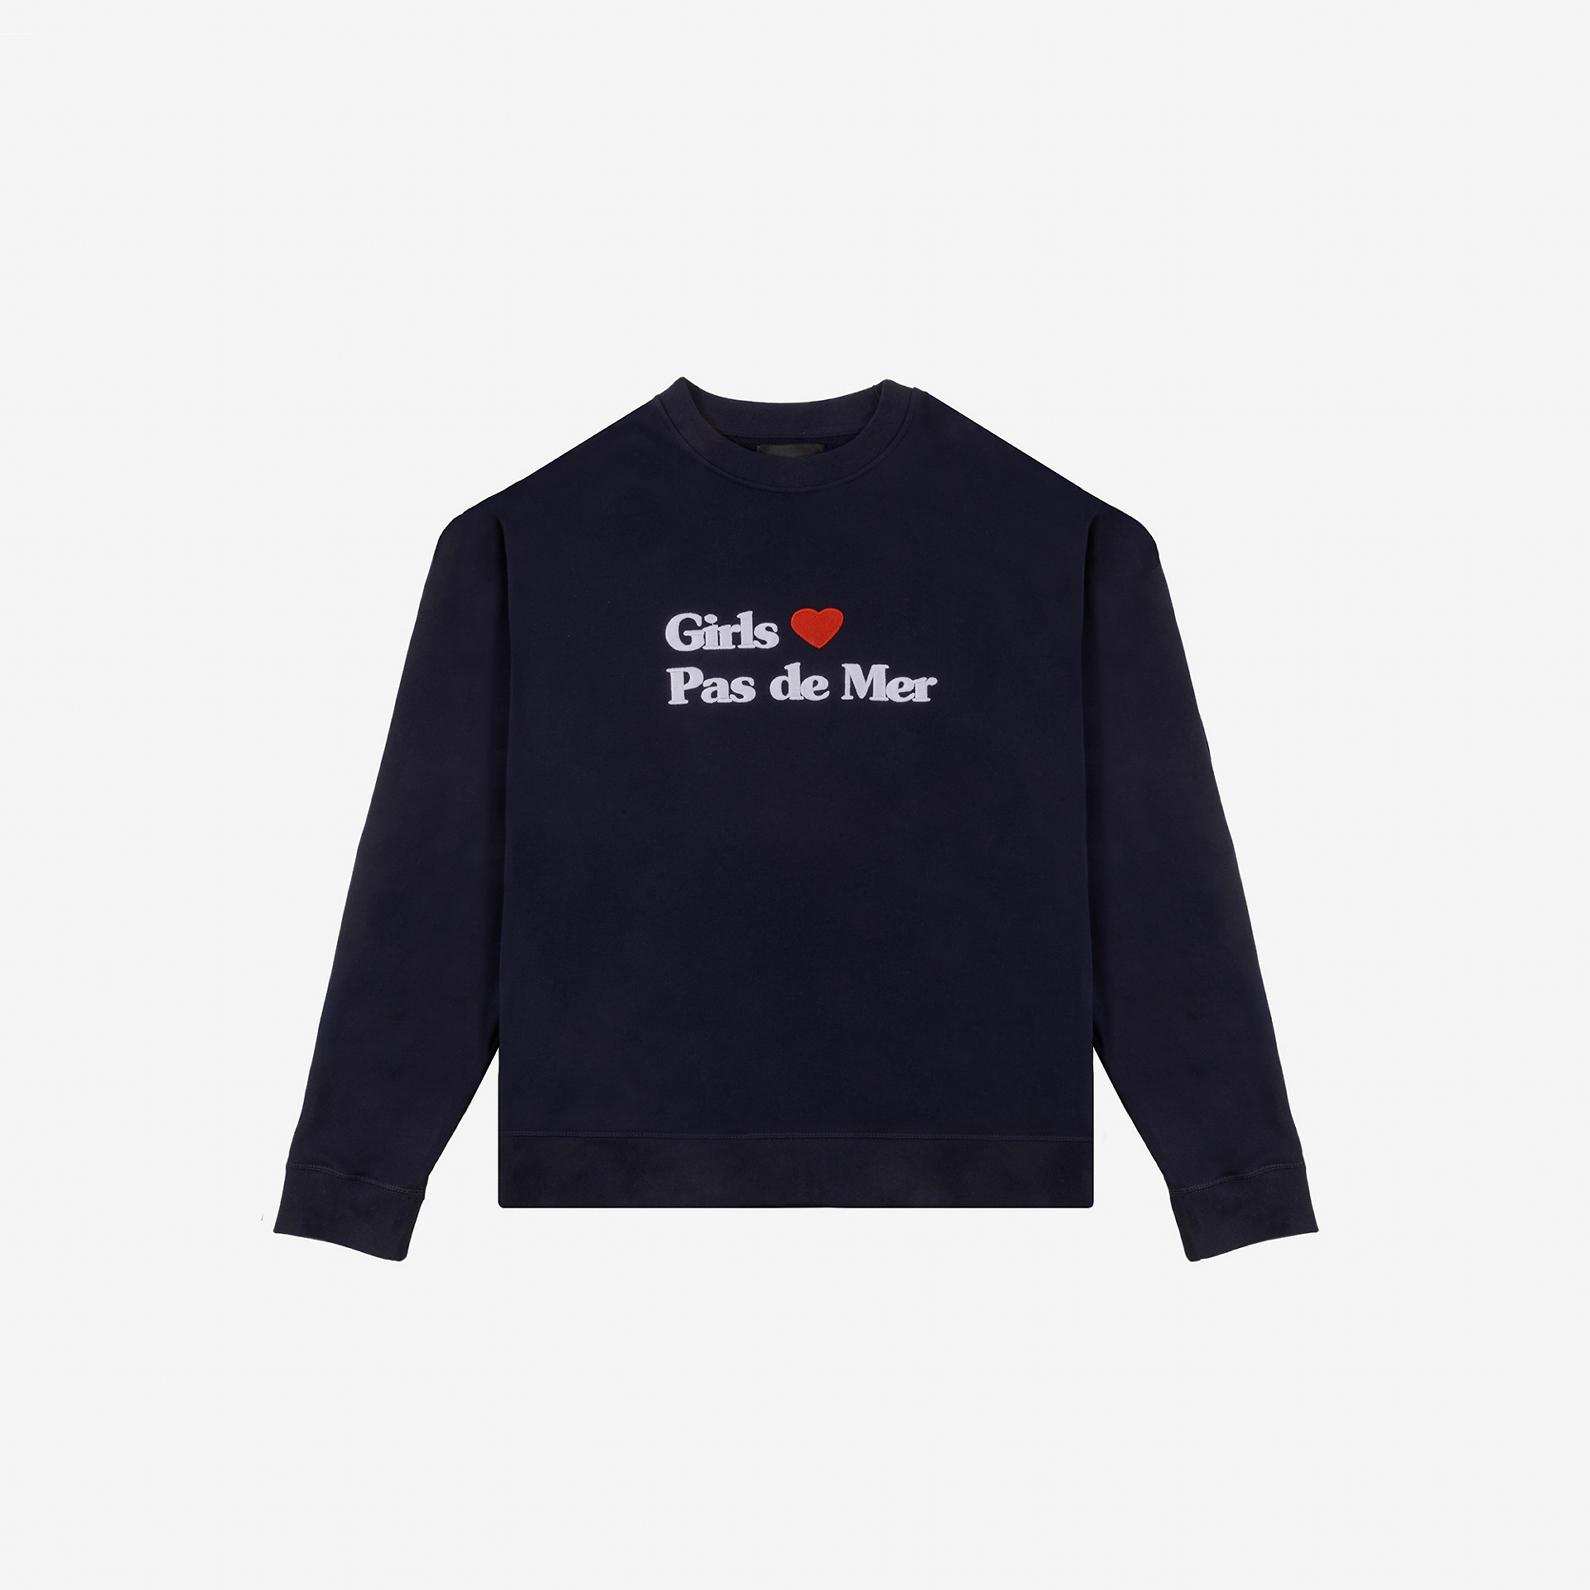 【PAS DE MER/パドゥメ】GIRLS LOVE OVERSIZE SWEATSHIRT クルーネックスウェット / NAVY